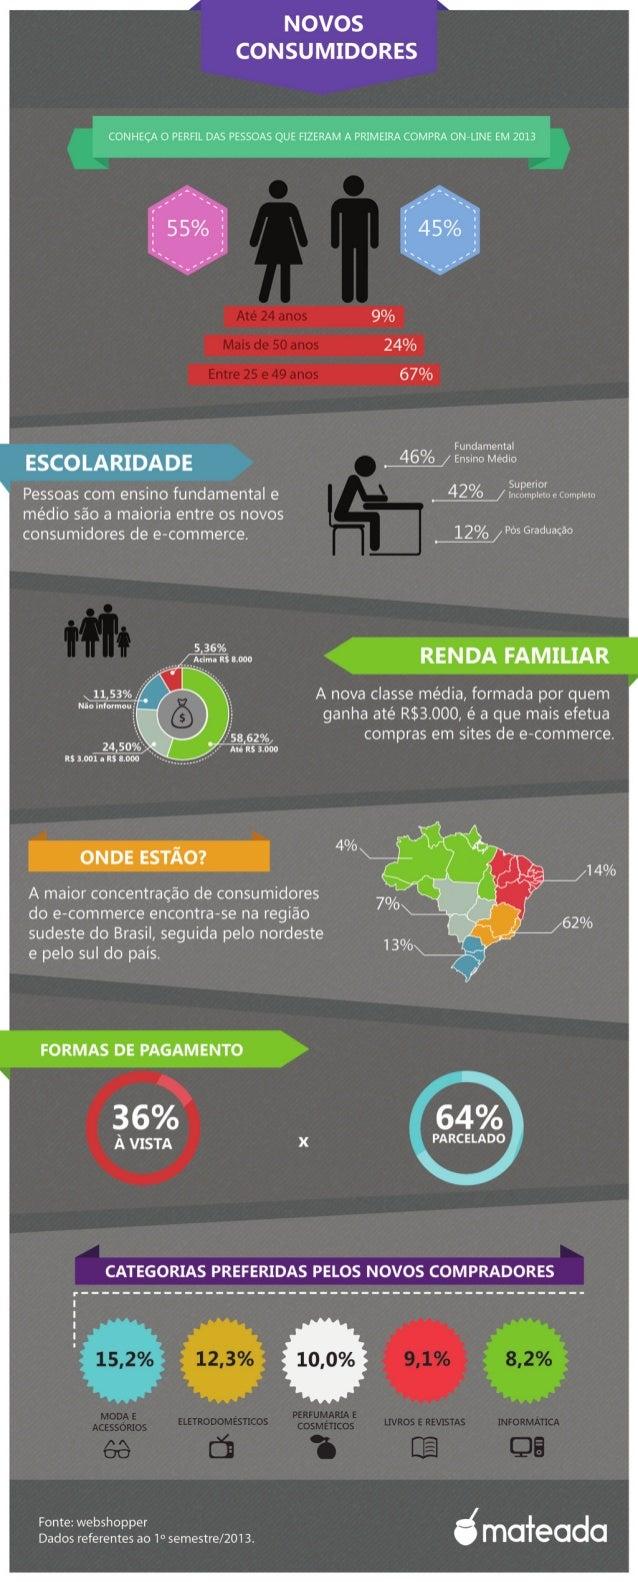 O perfil dos novos consumidores on-line